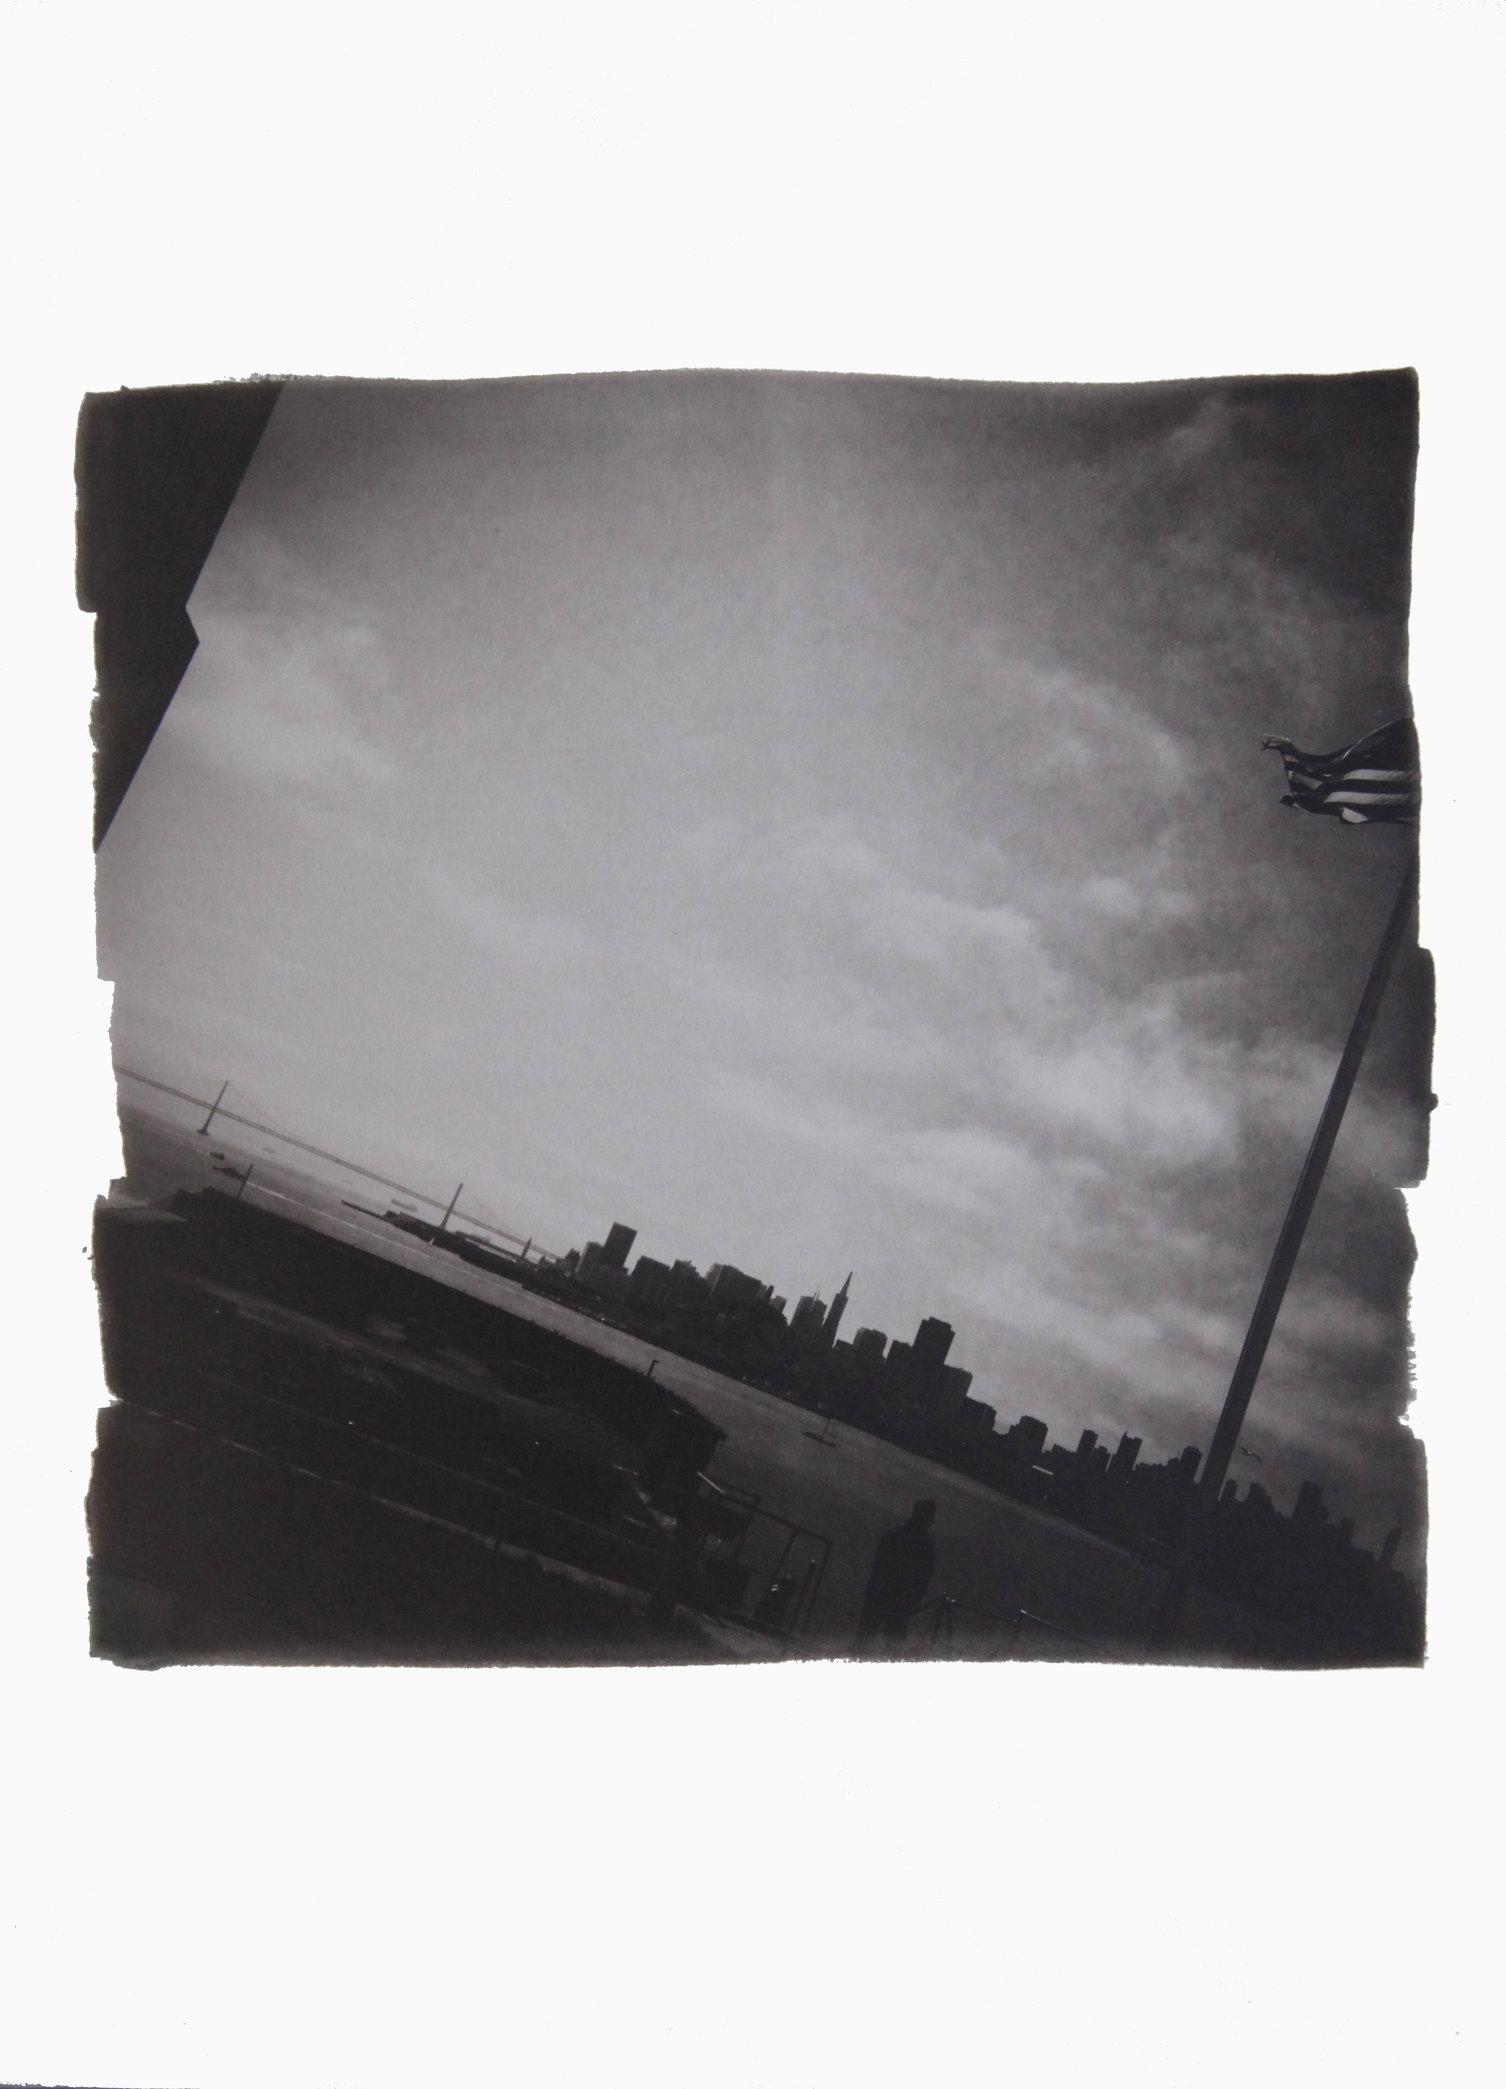 American Diary-048.JPG